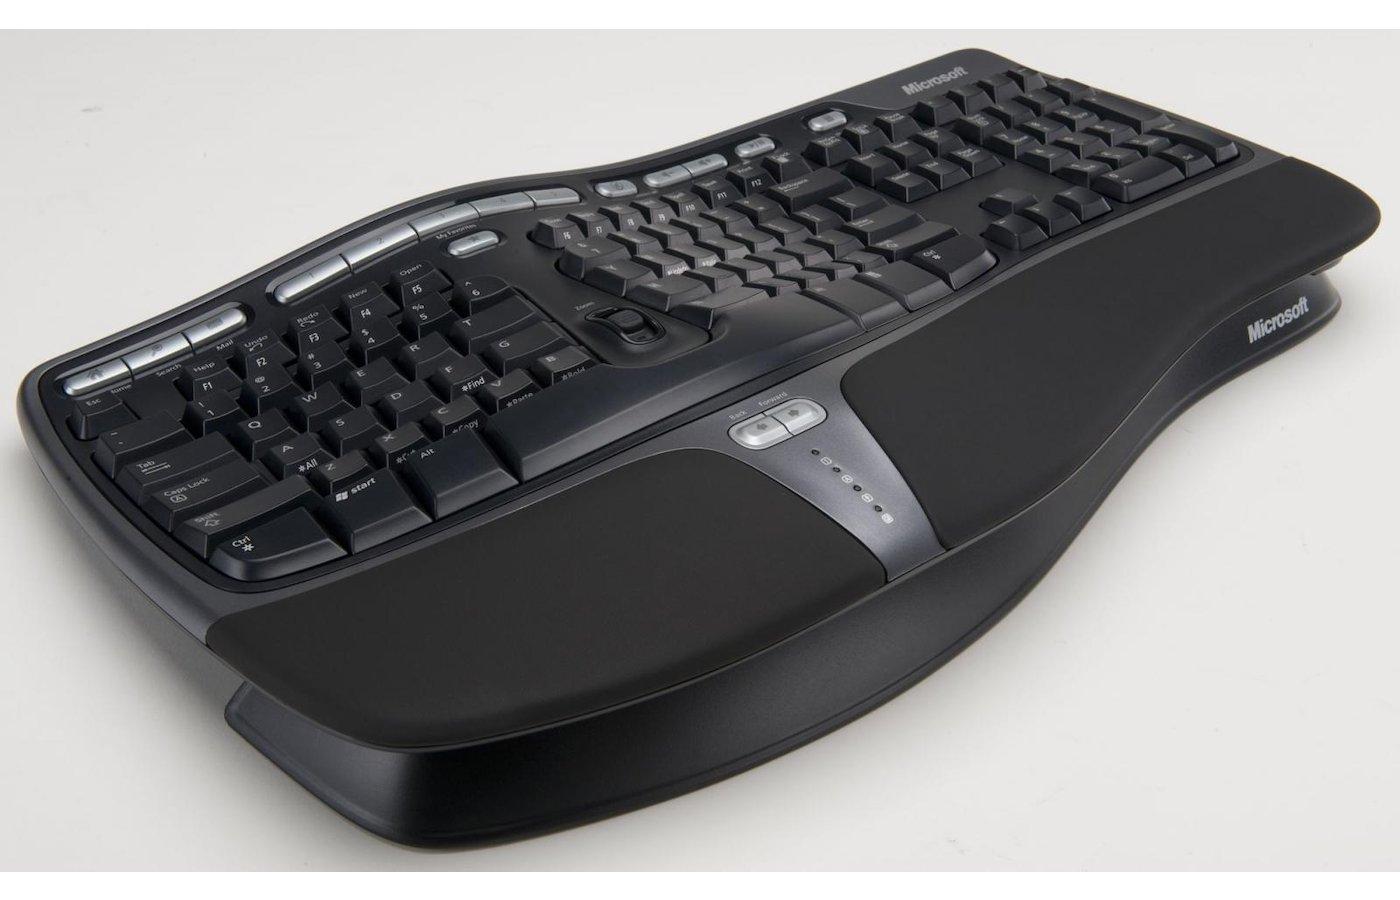 Клавиатура проводная Microsoft Retail Natural Ergonomic Keyboard 4000 USB (B2M-00020)